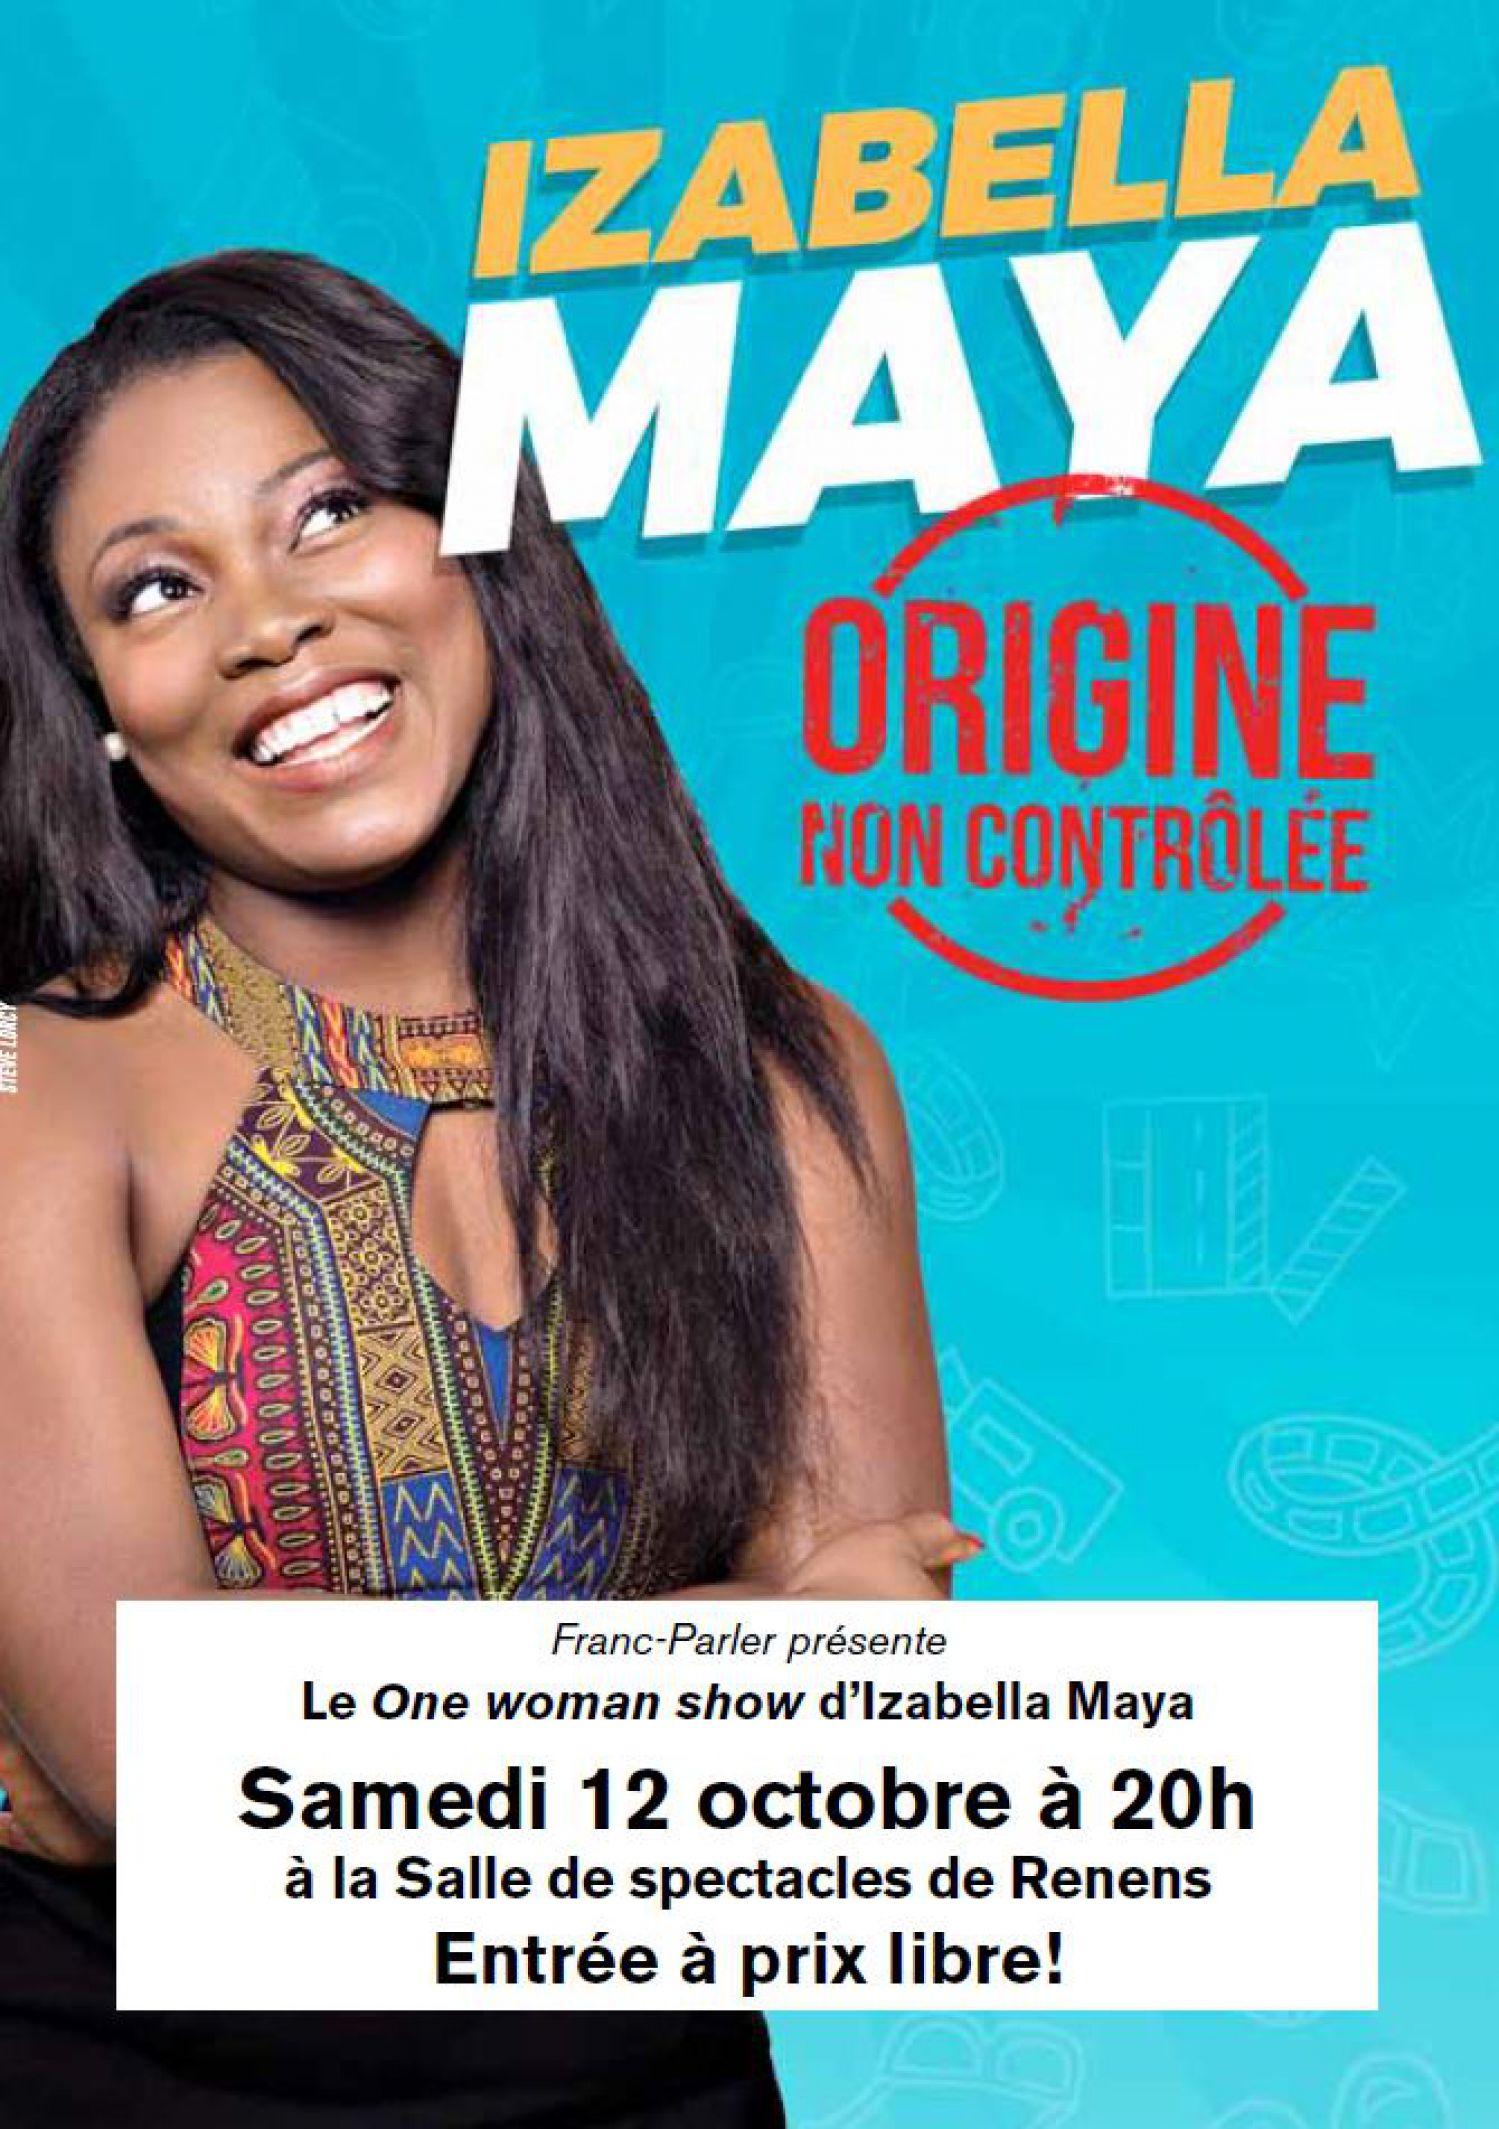 One woman show d'Izabella Maya, Origine non contrôlée